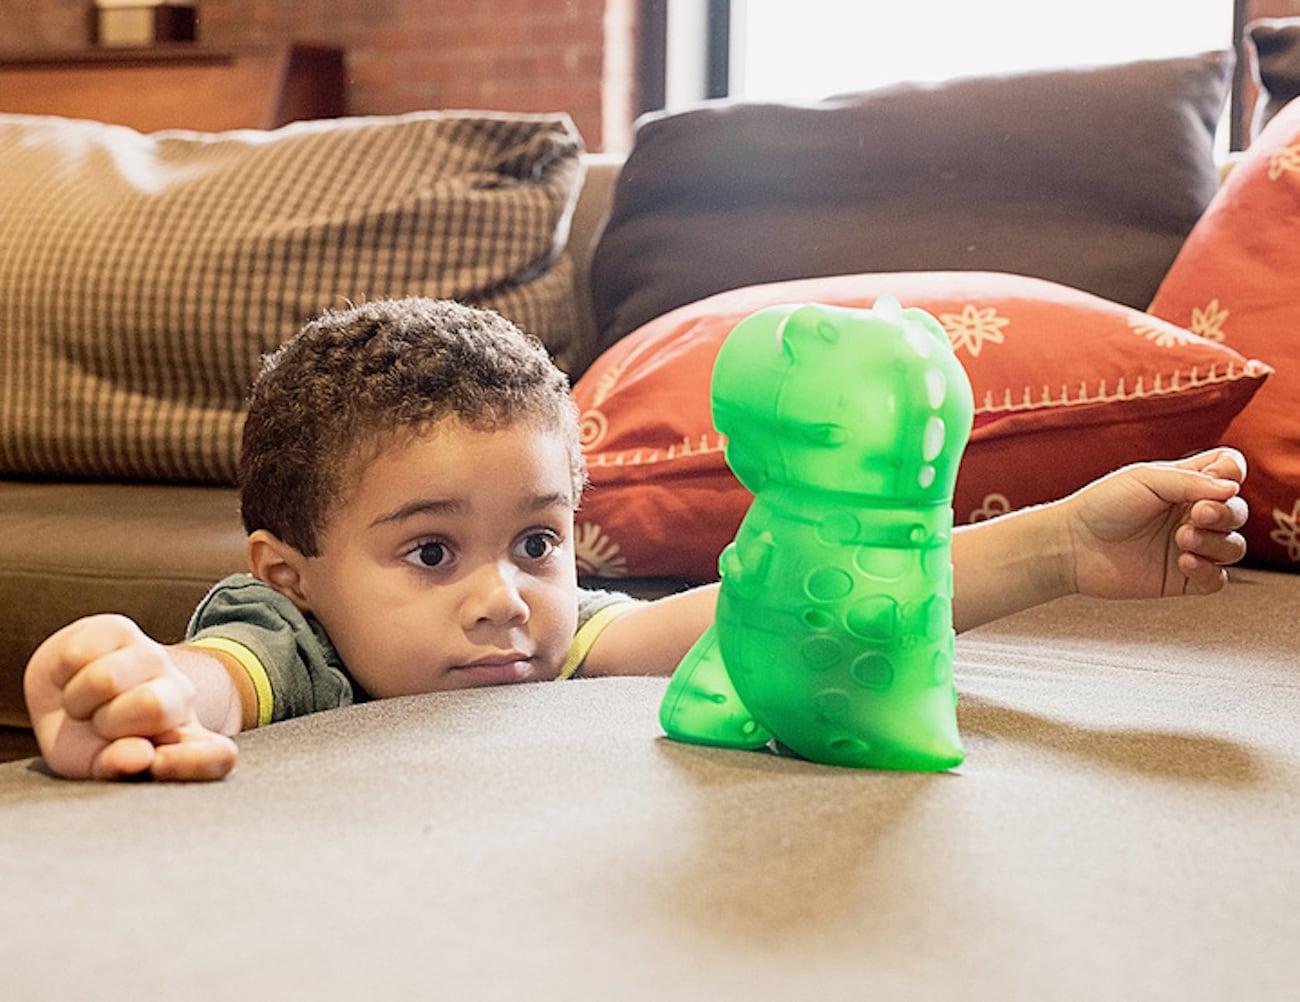 STEMosaur Artificial Intelligence Interactive Toy